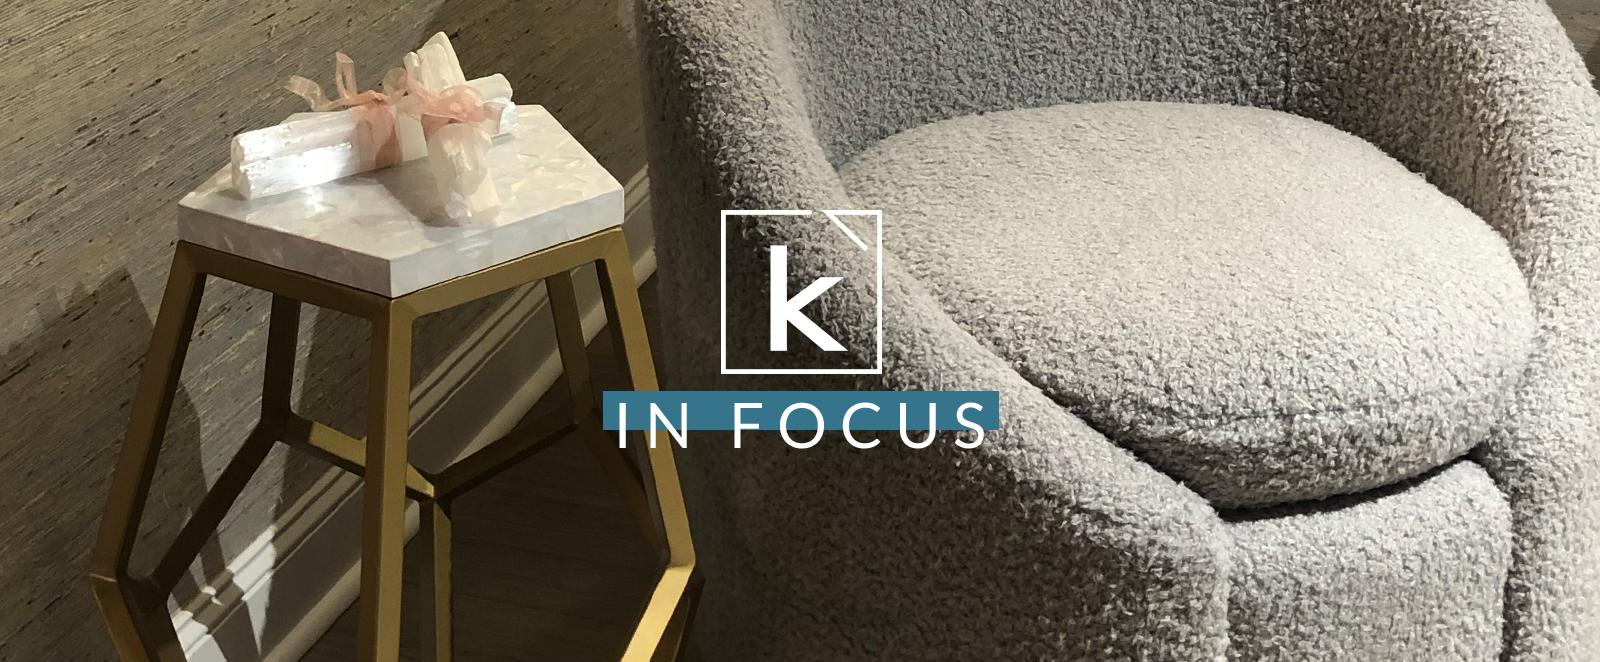 universal-miranda-kerr-home-chair-table